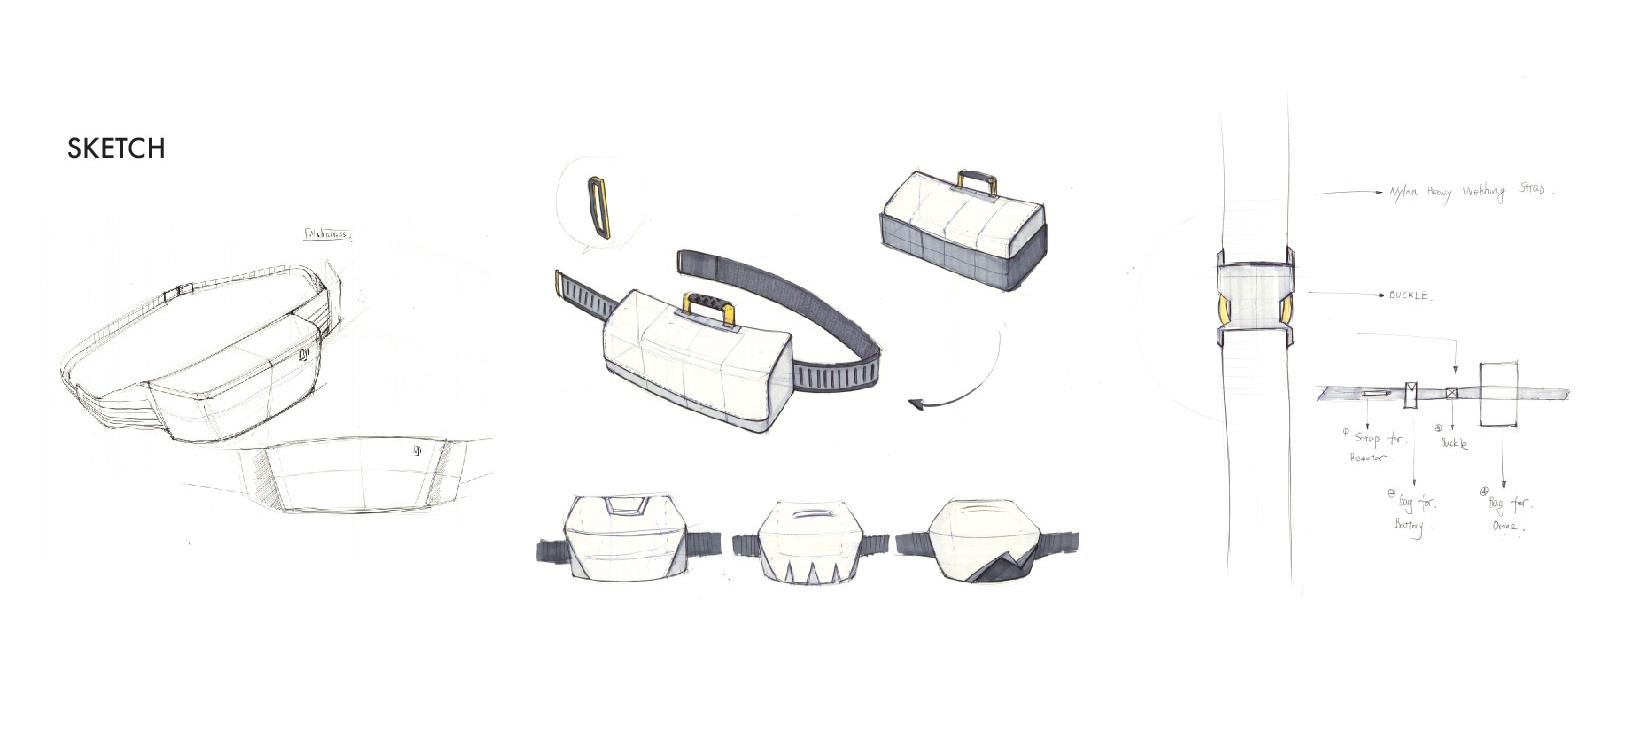 bag design sketch by Jay Qian